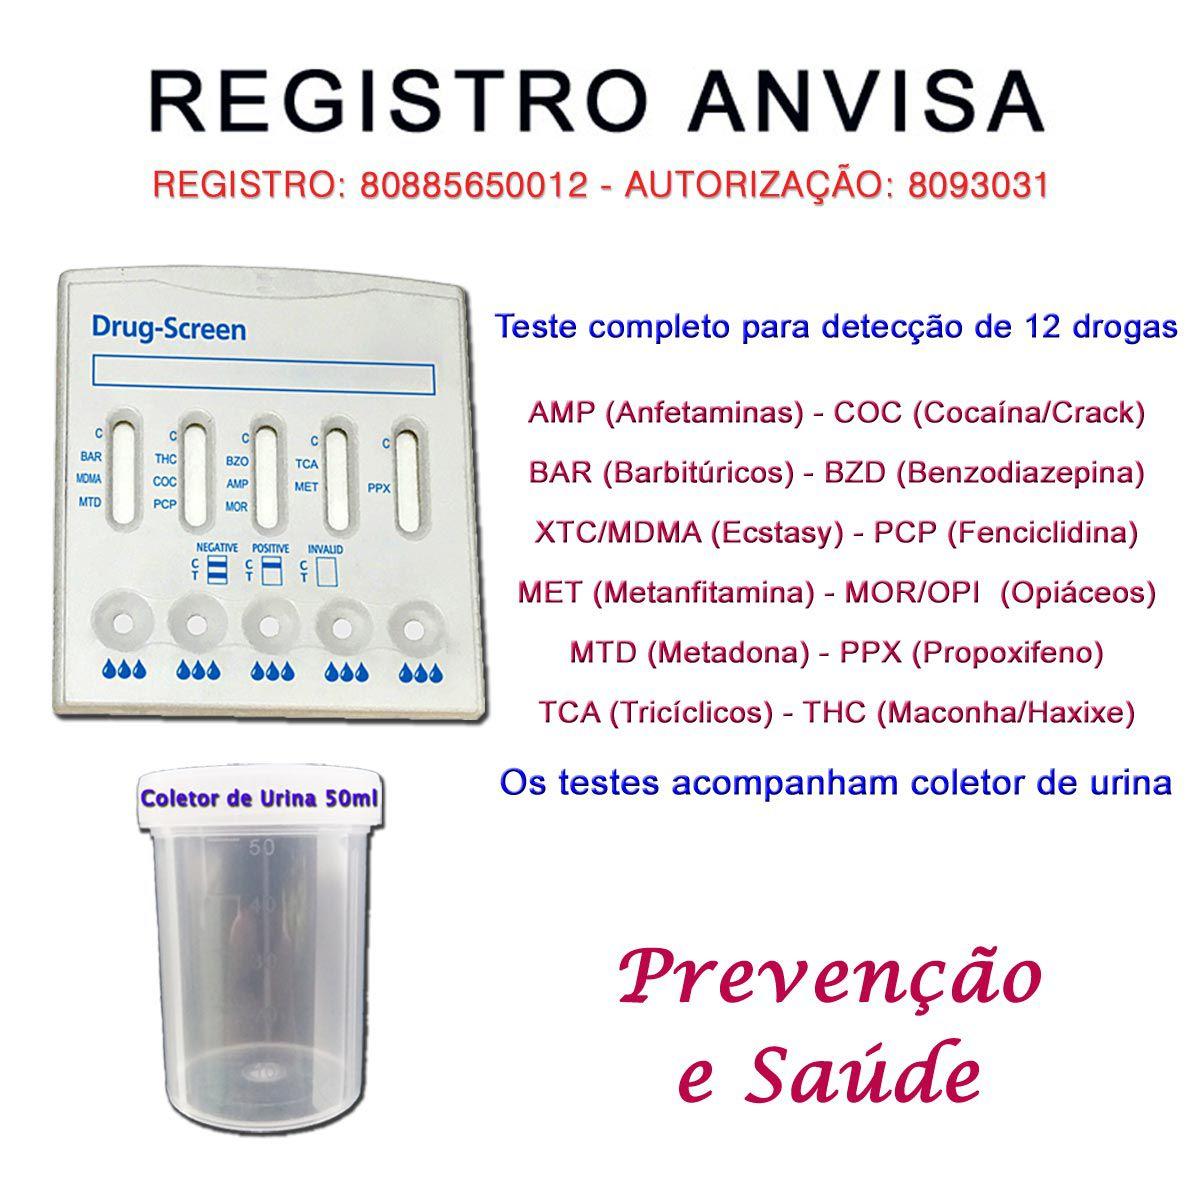 25 Kits para testes de 12 substâncias  - Testes Para Drogas e Parar de Beber e Fumar